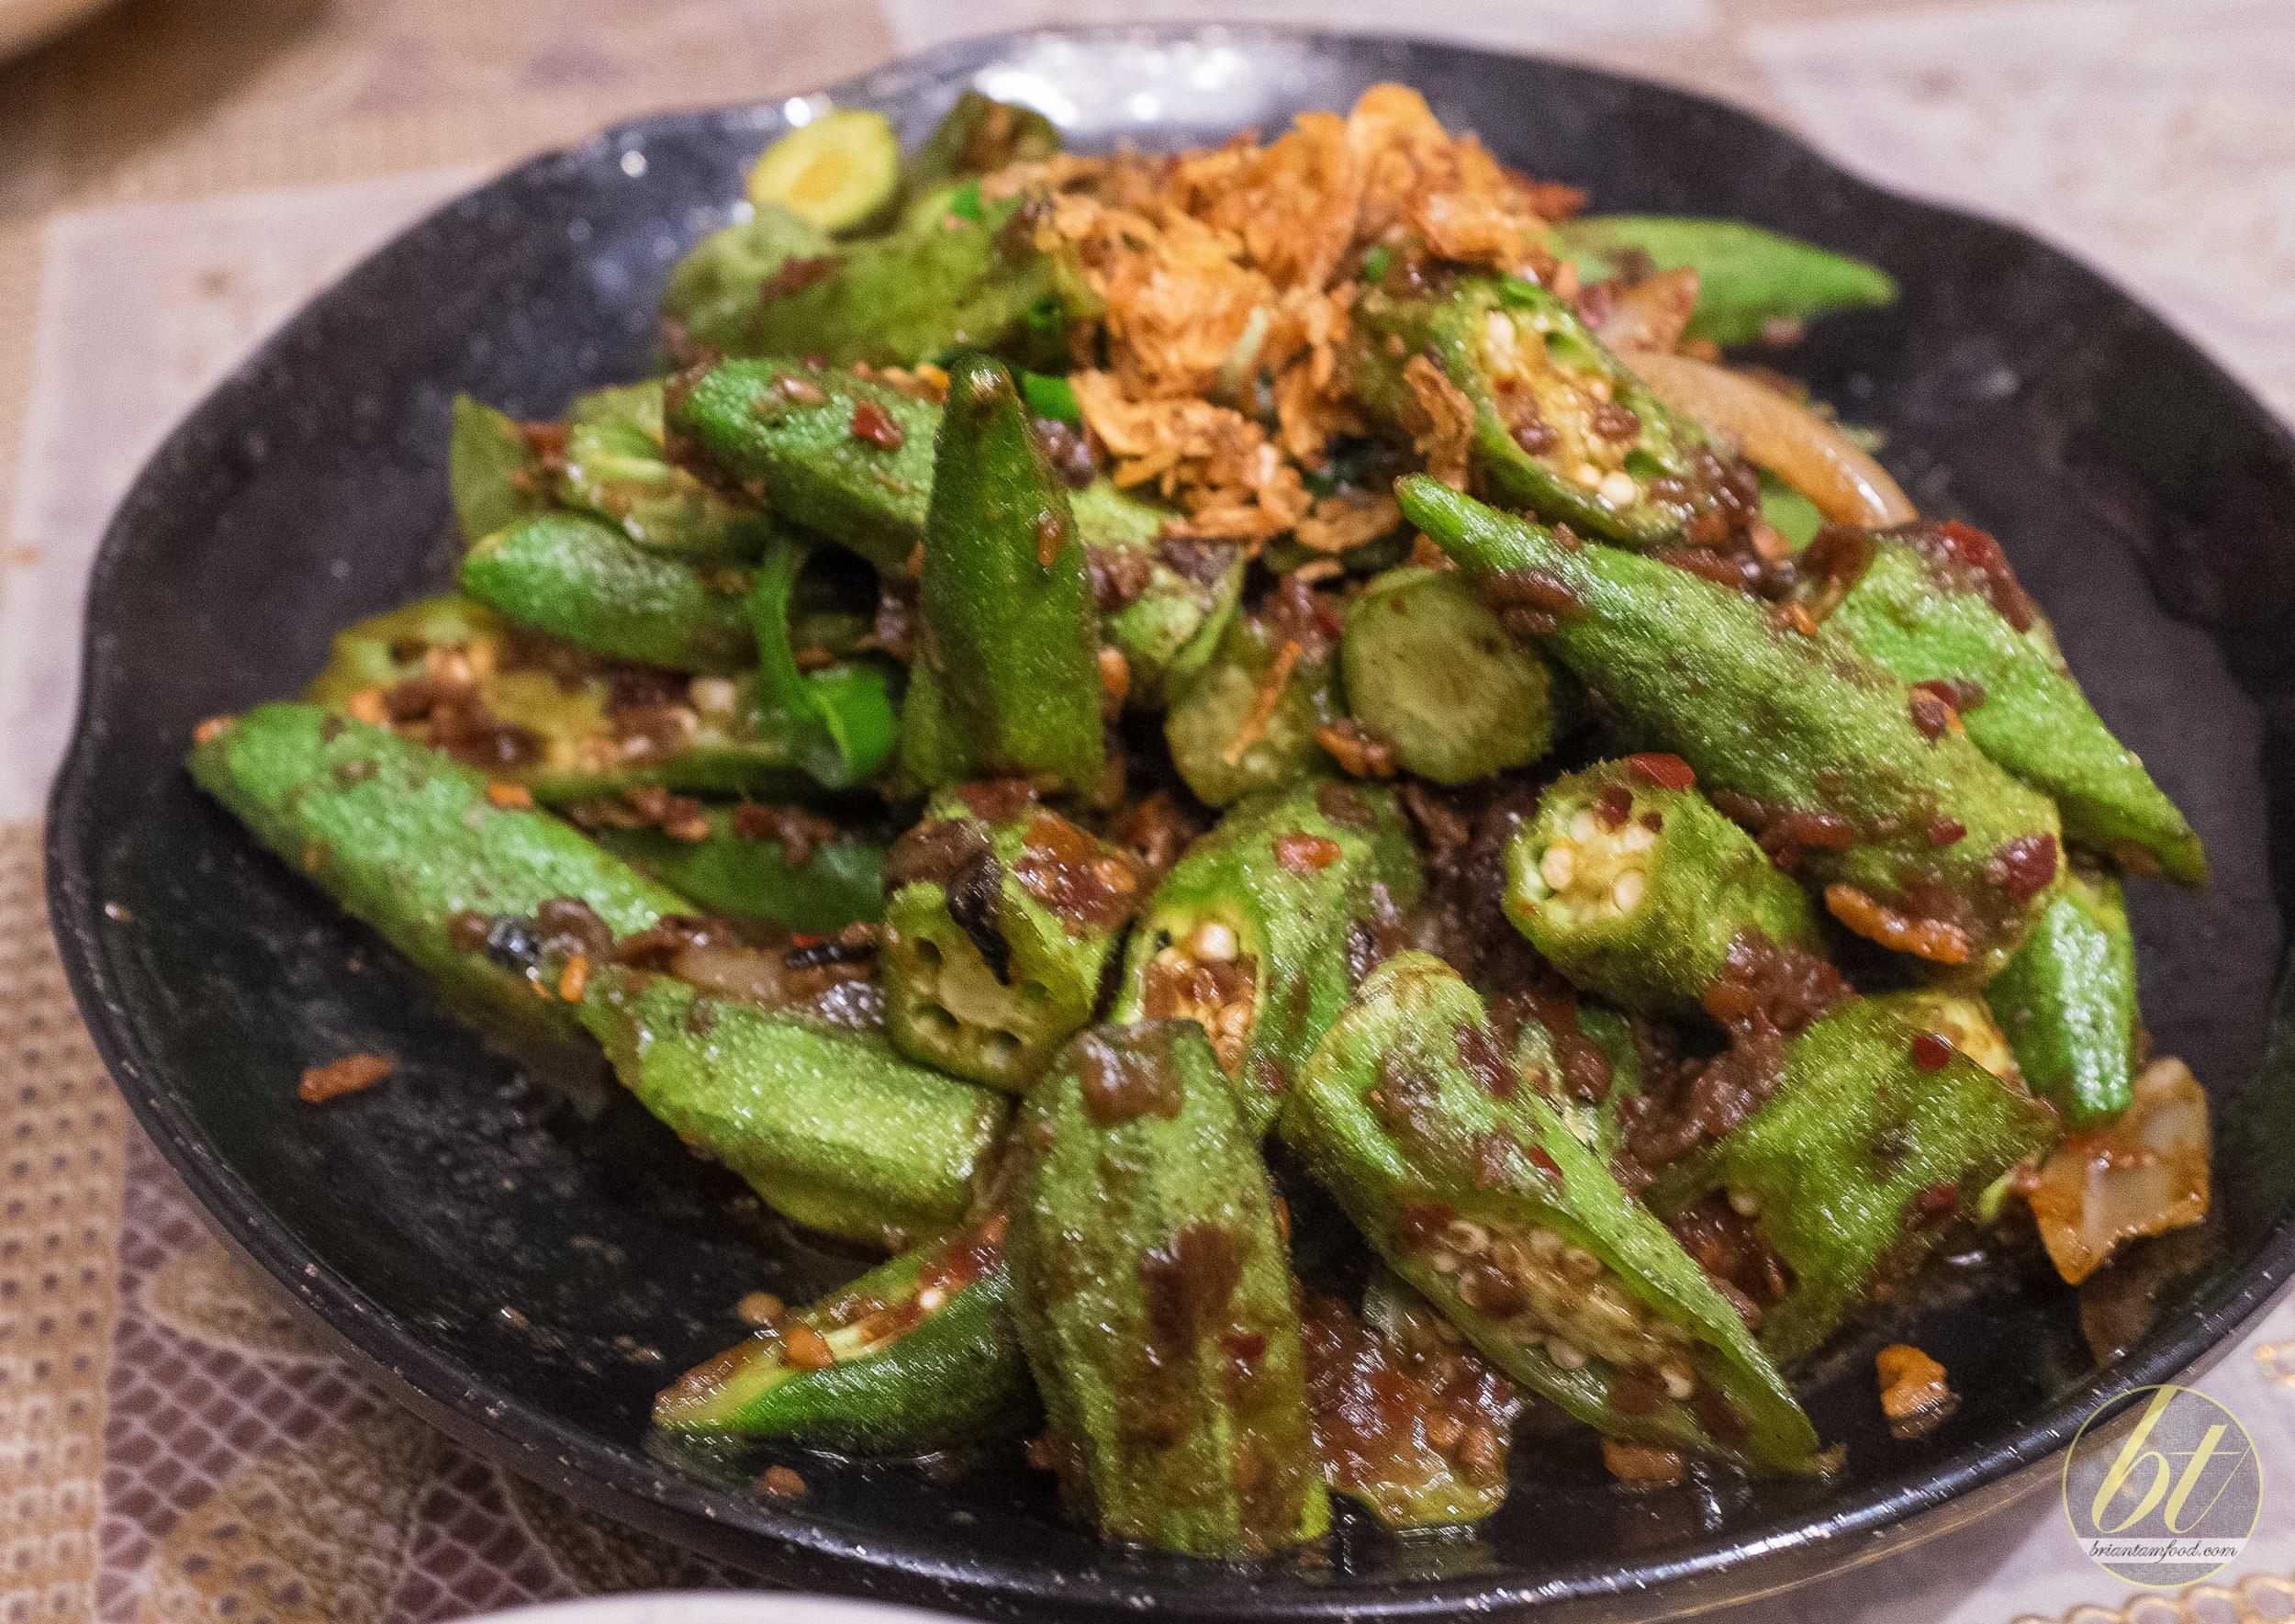 Albee's Malaysian Kitchen Campsie Okra